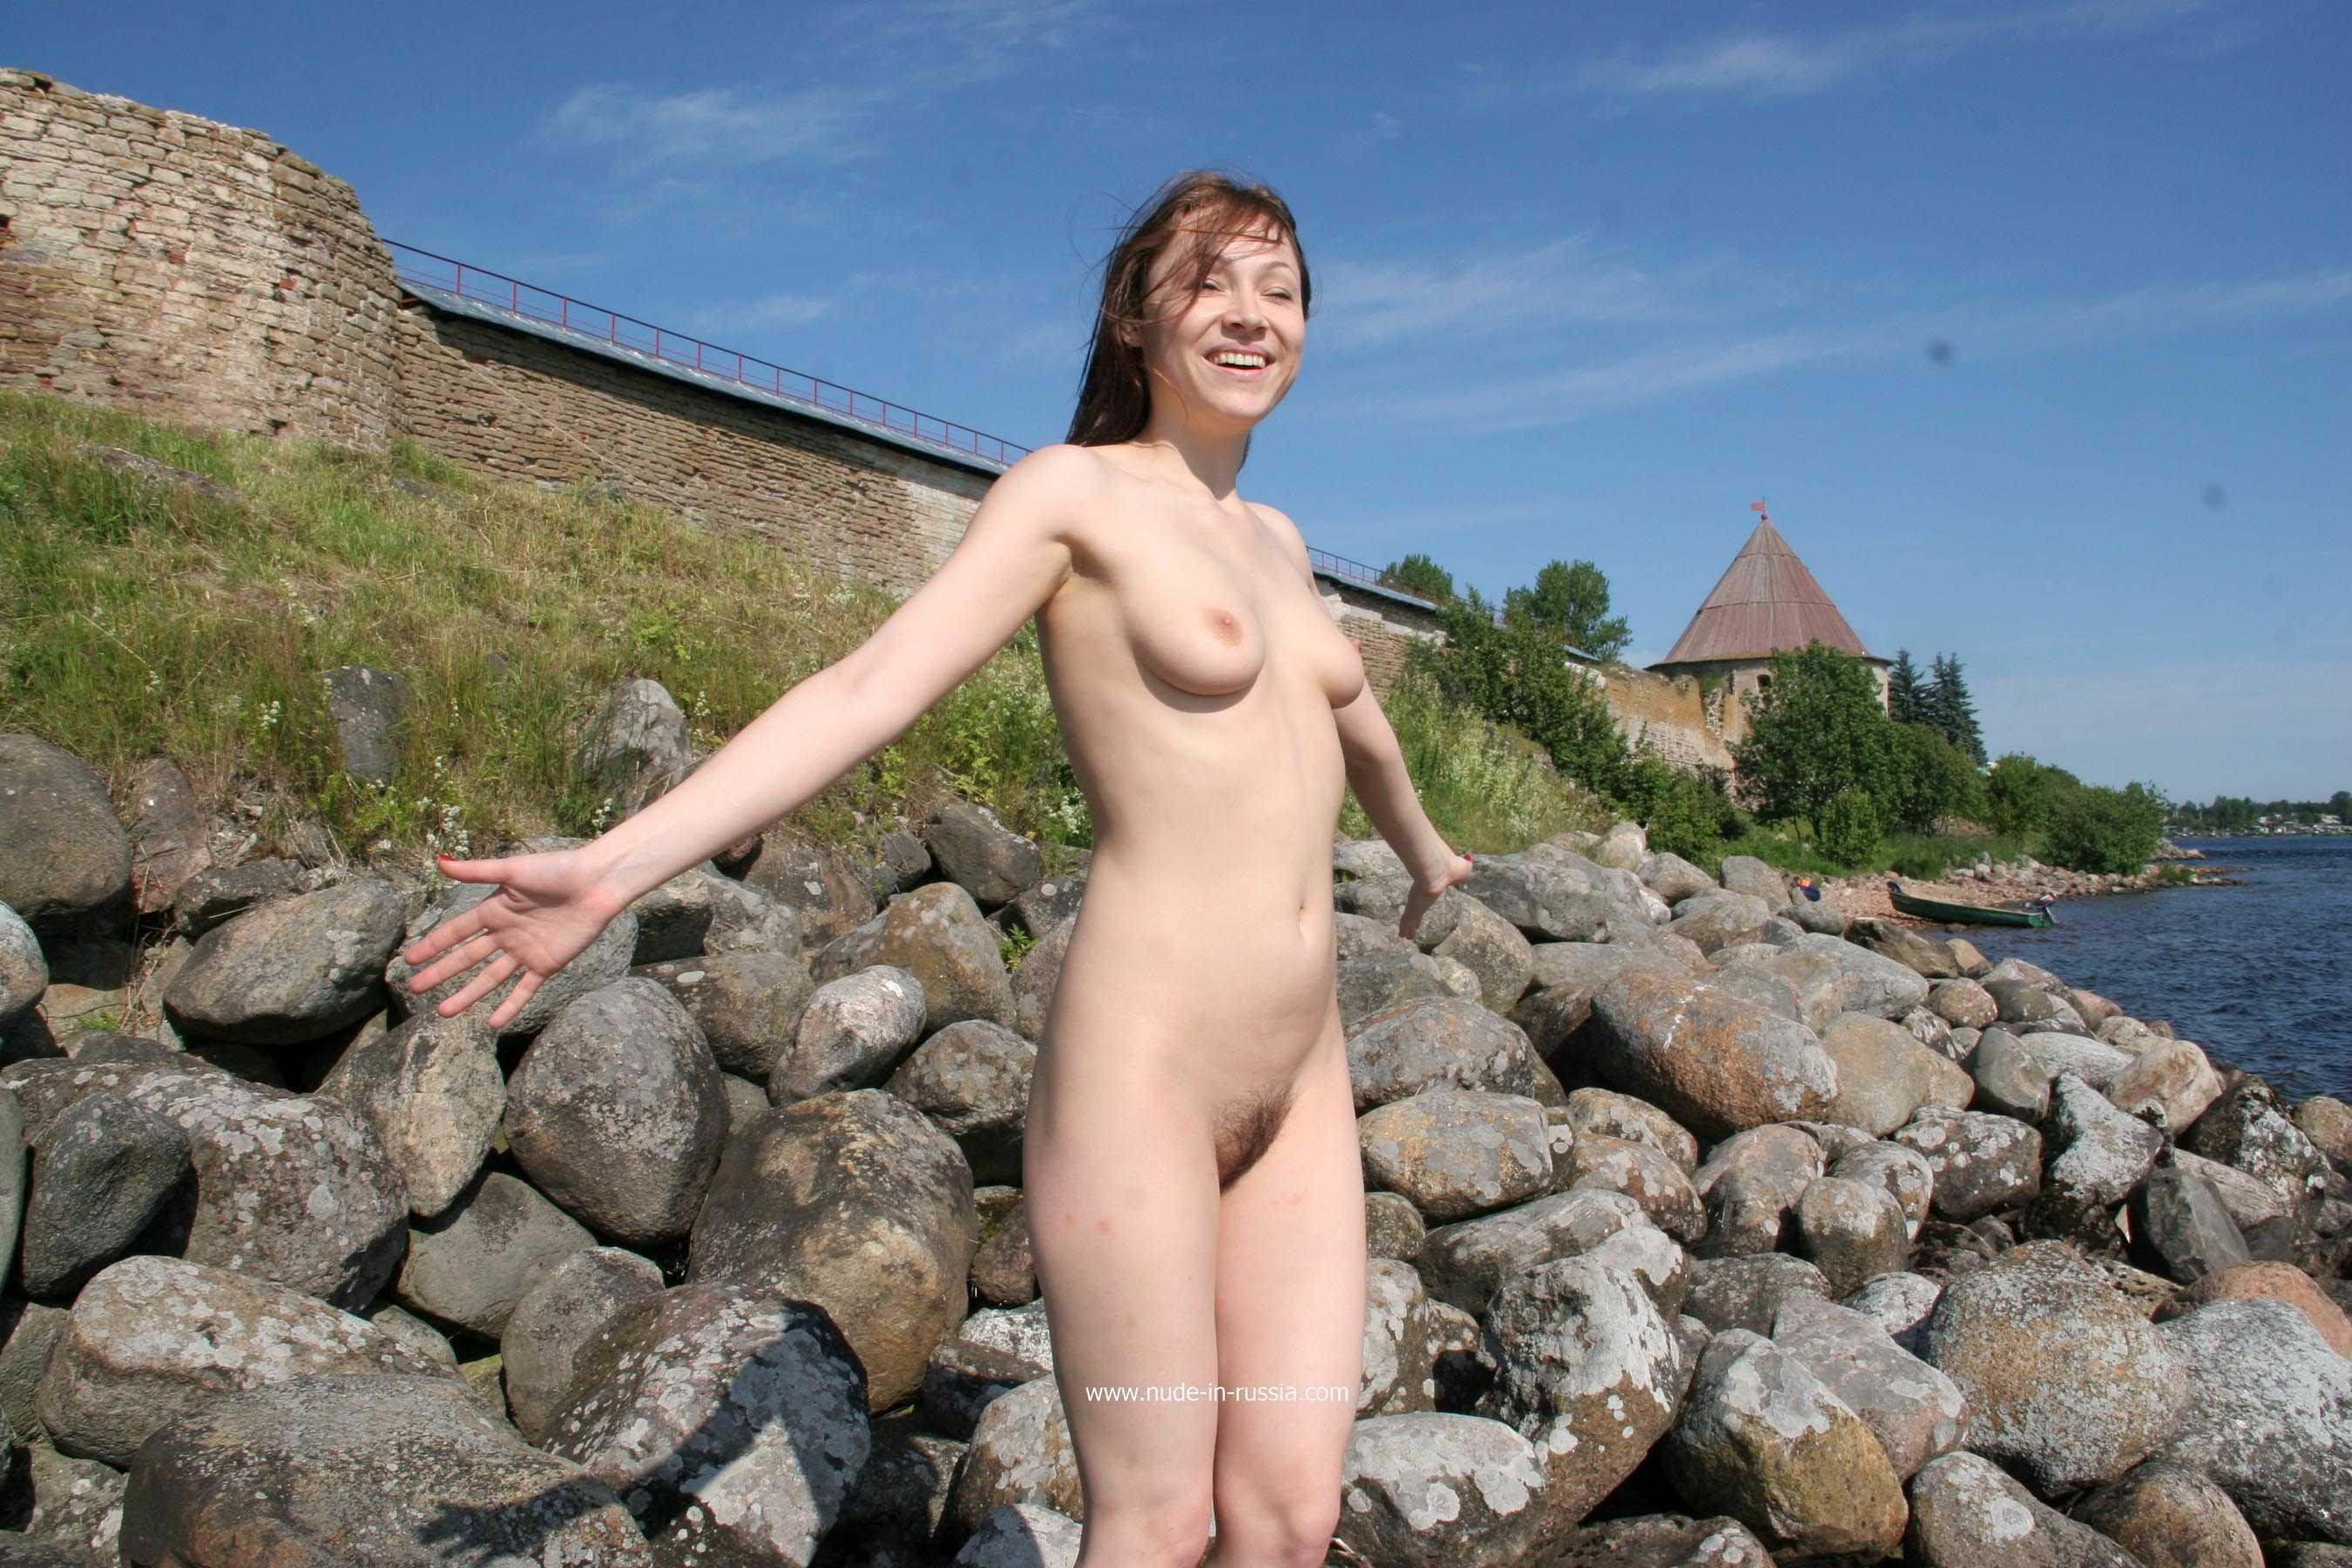 Nude Man Post